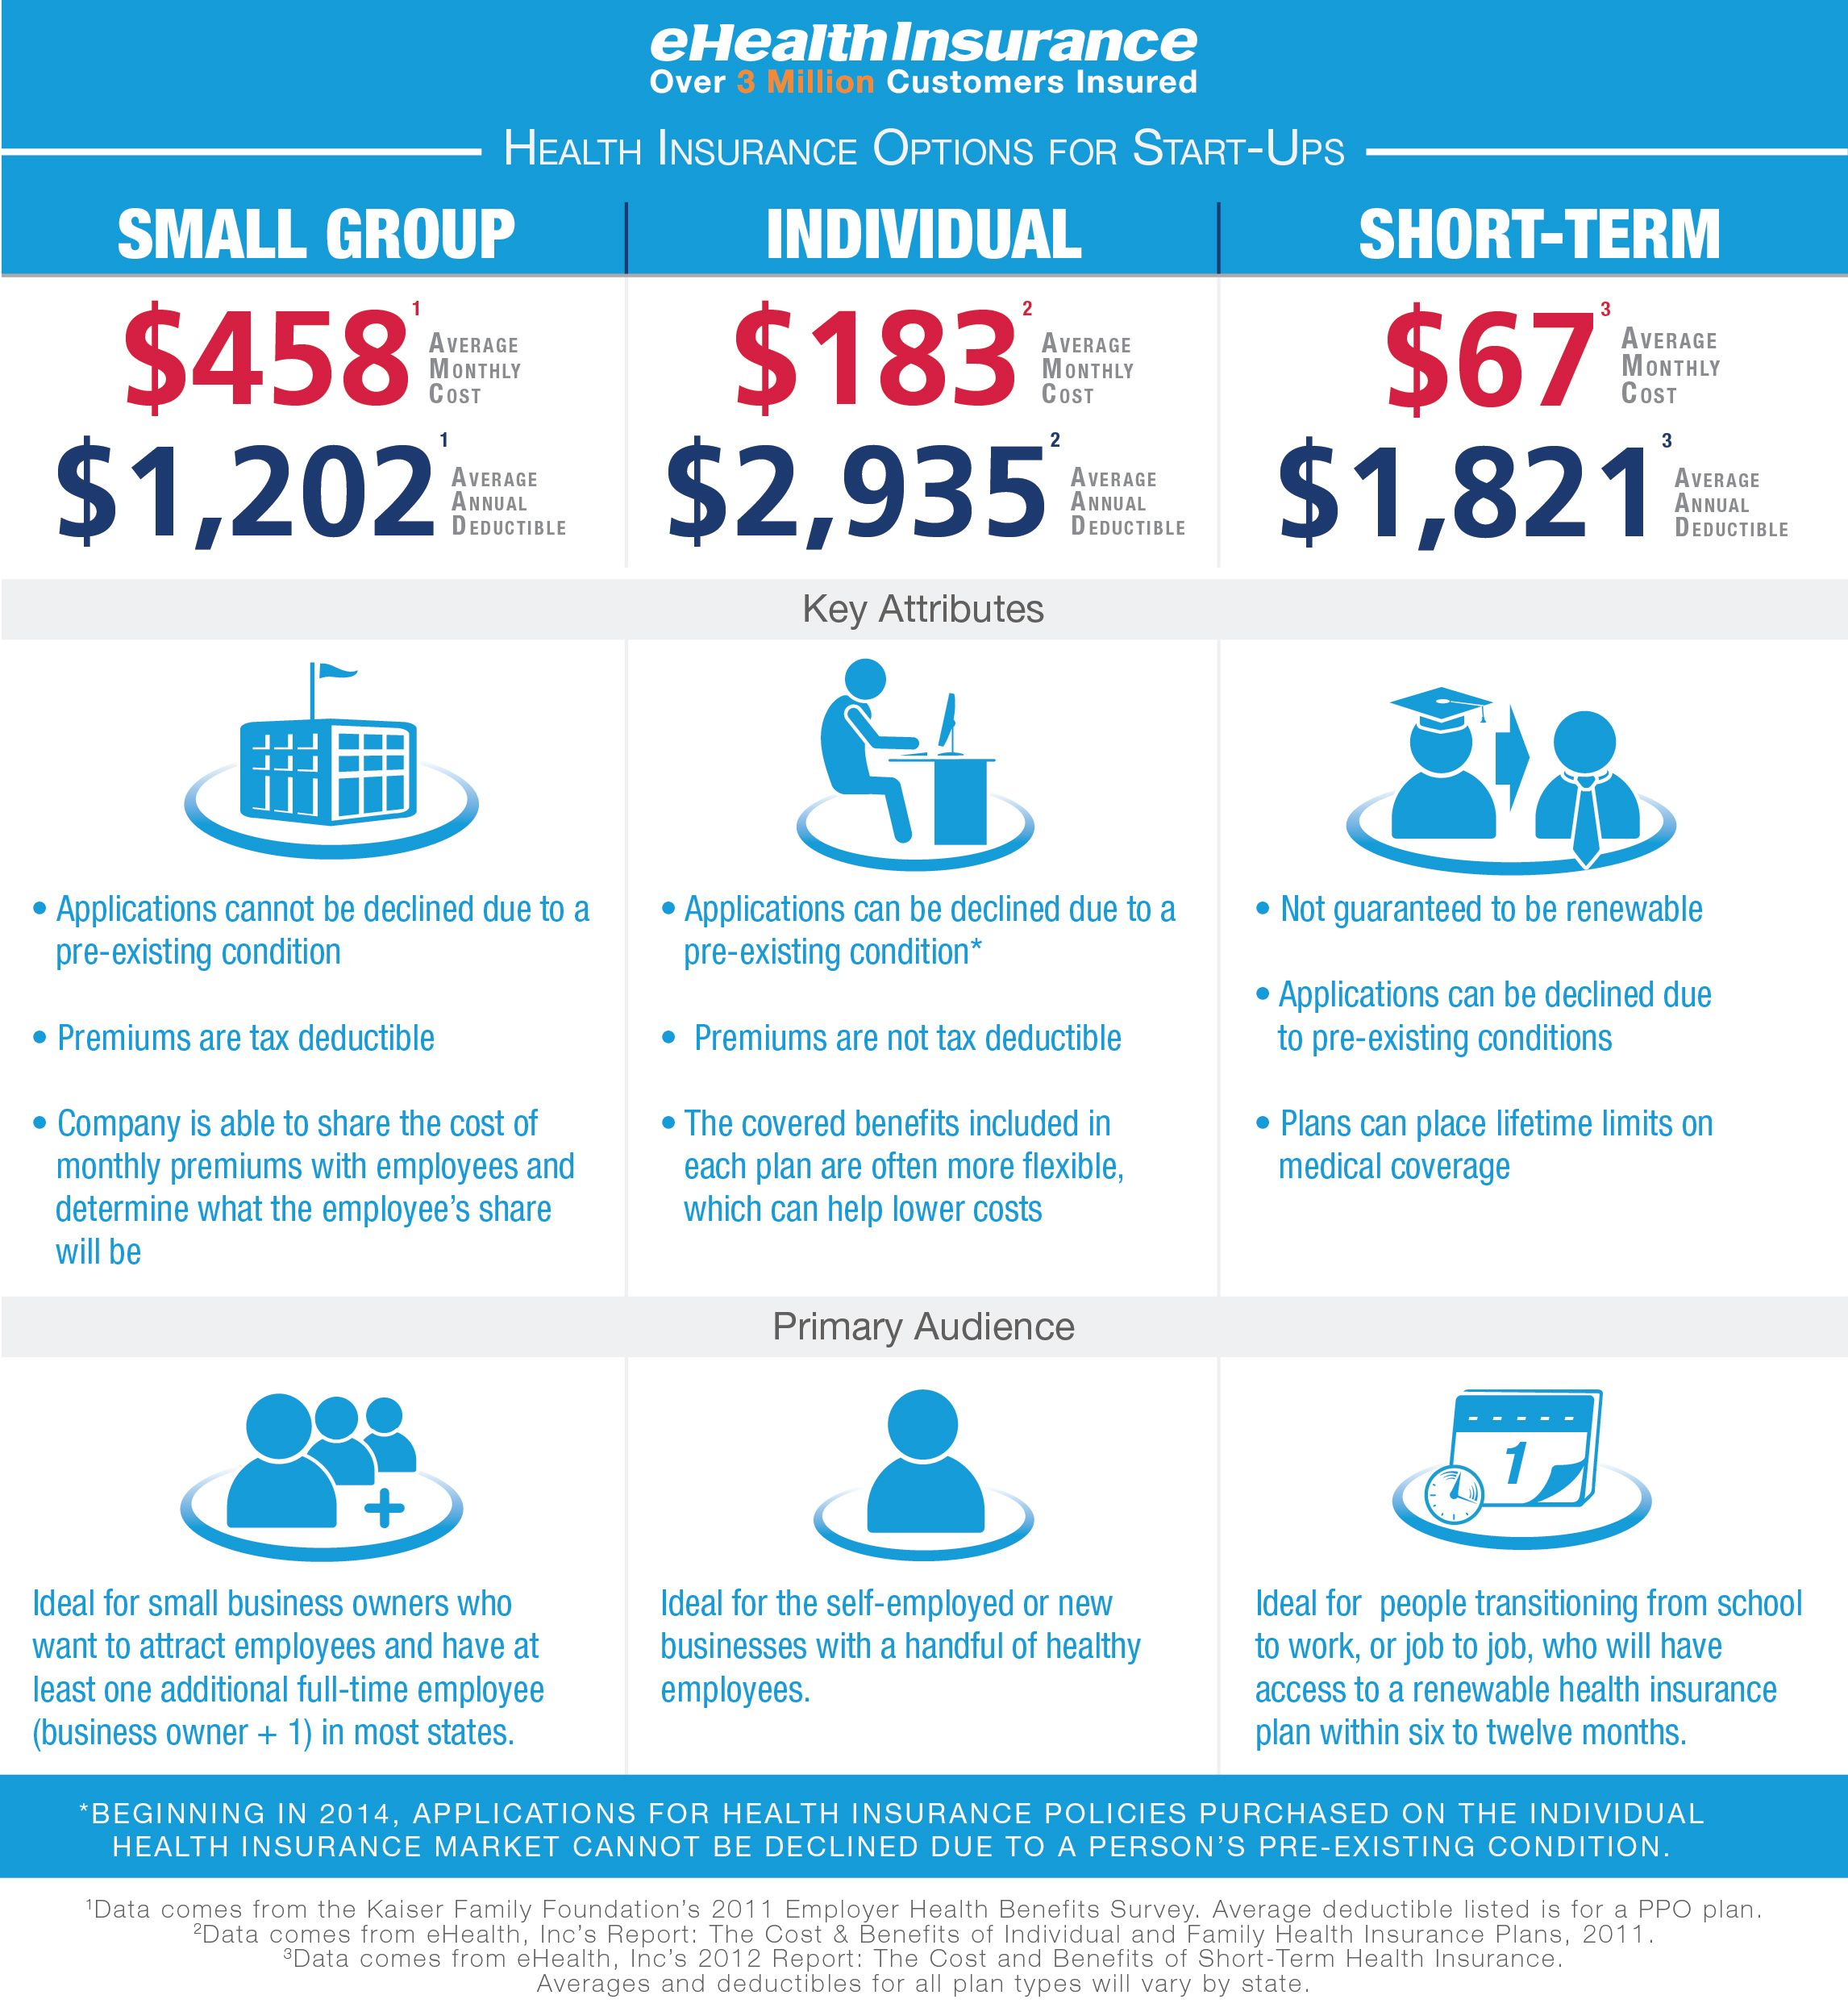 Infographic NIA Creative designed on behalf of